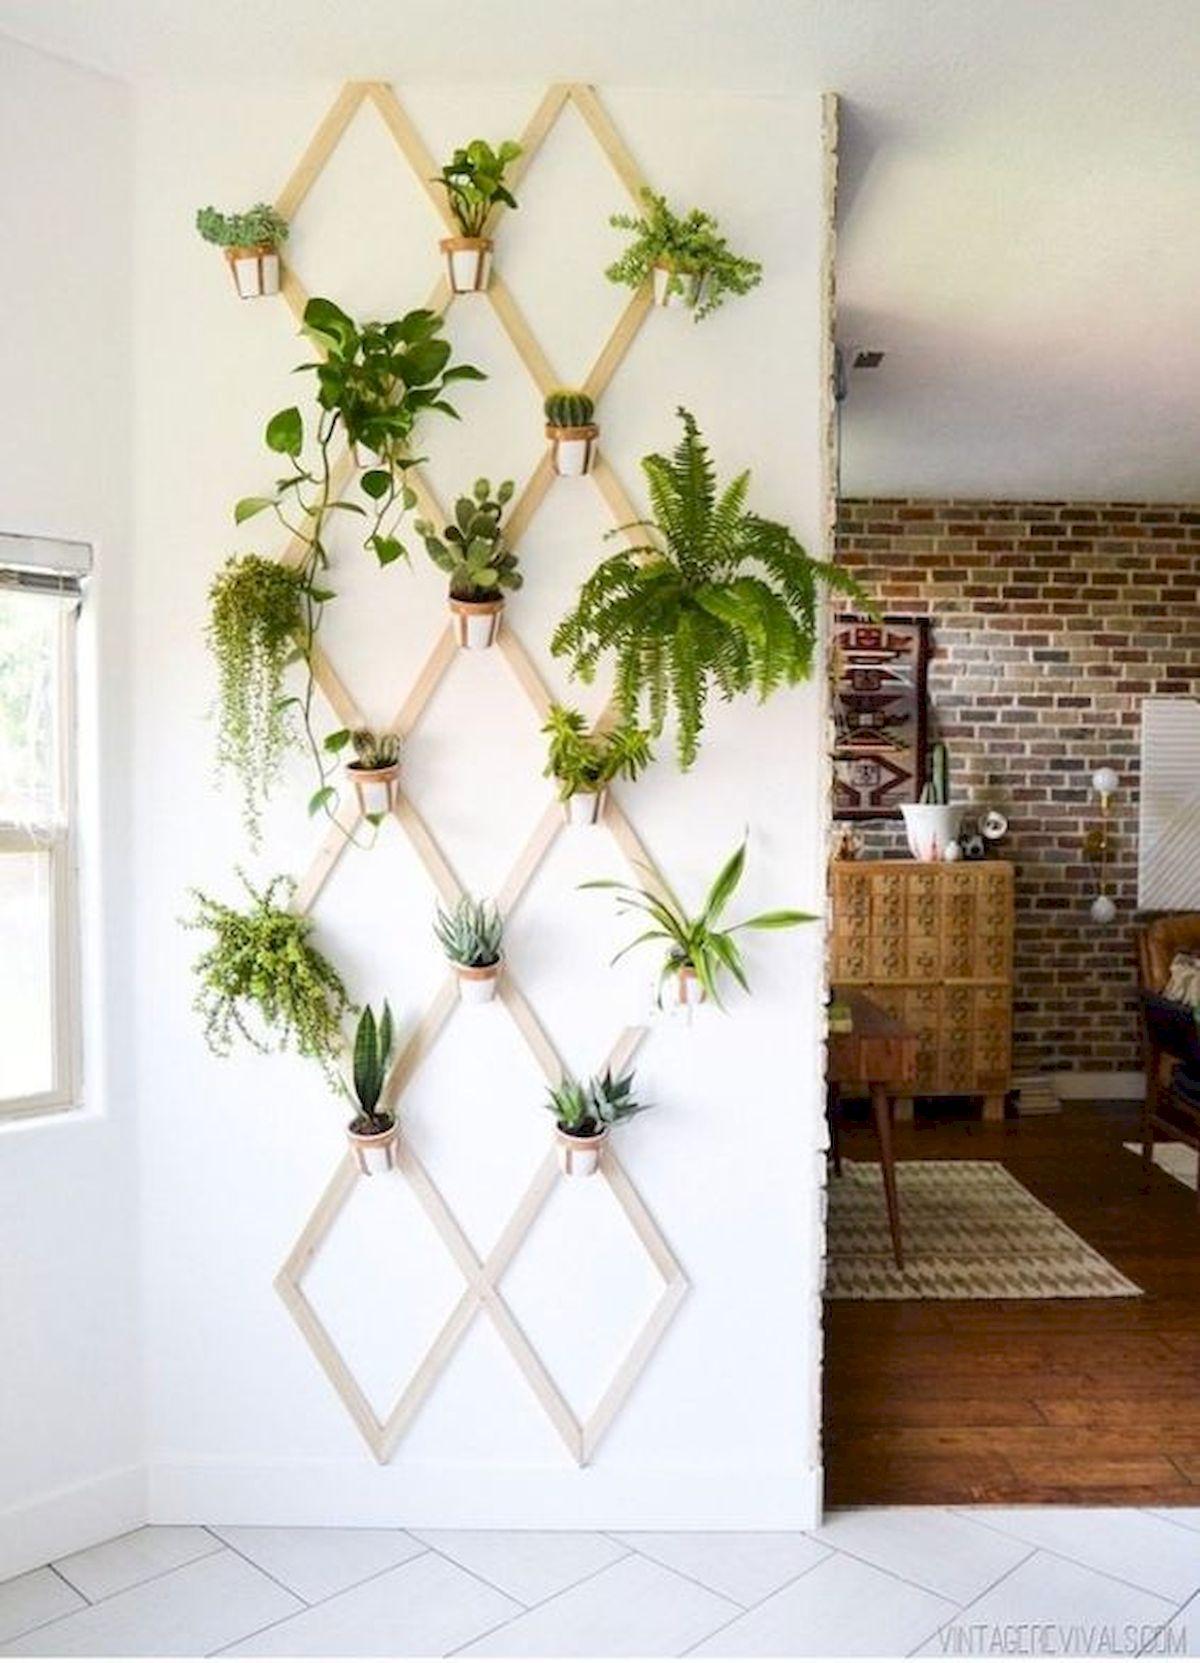 60 Creative DIY Home Decor Ideas for Apartments (47)